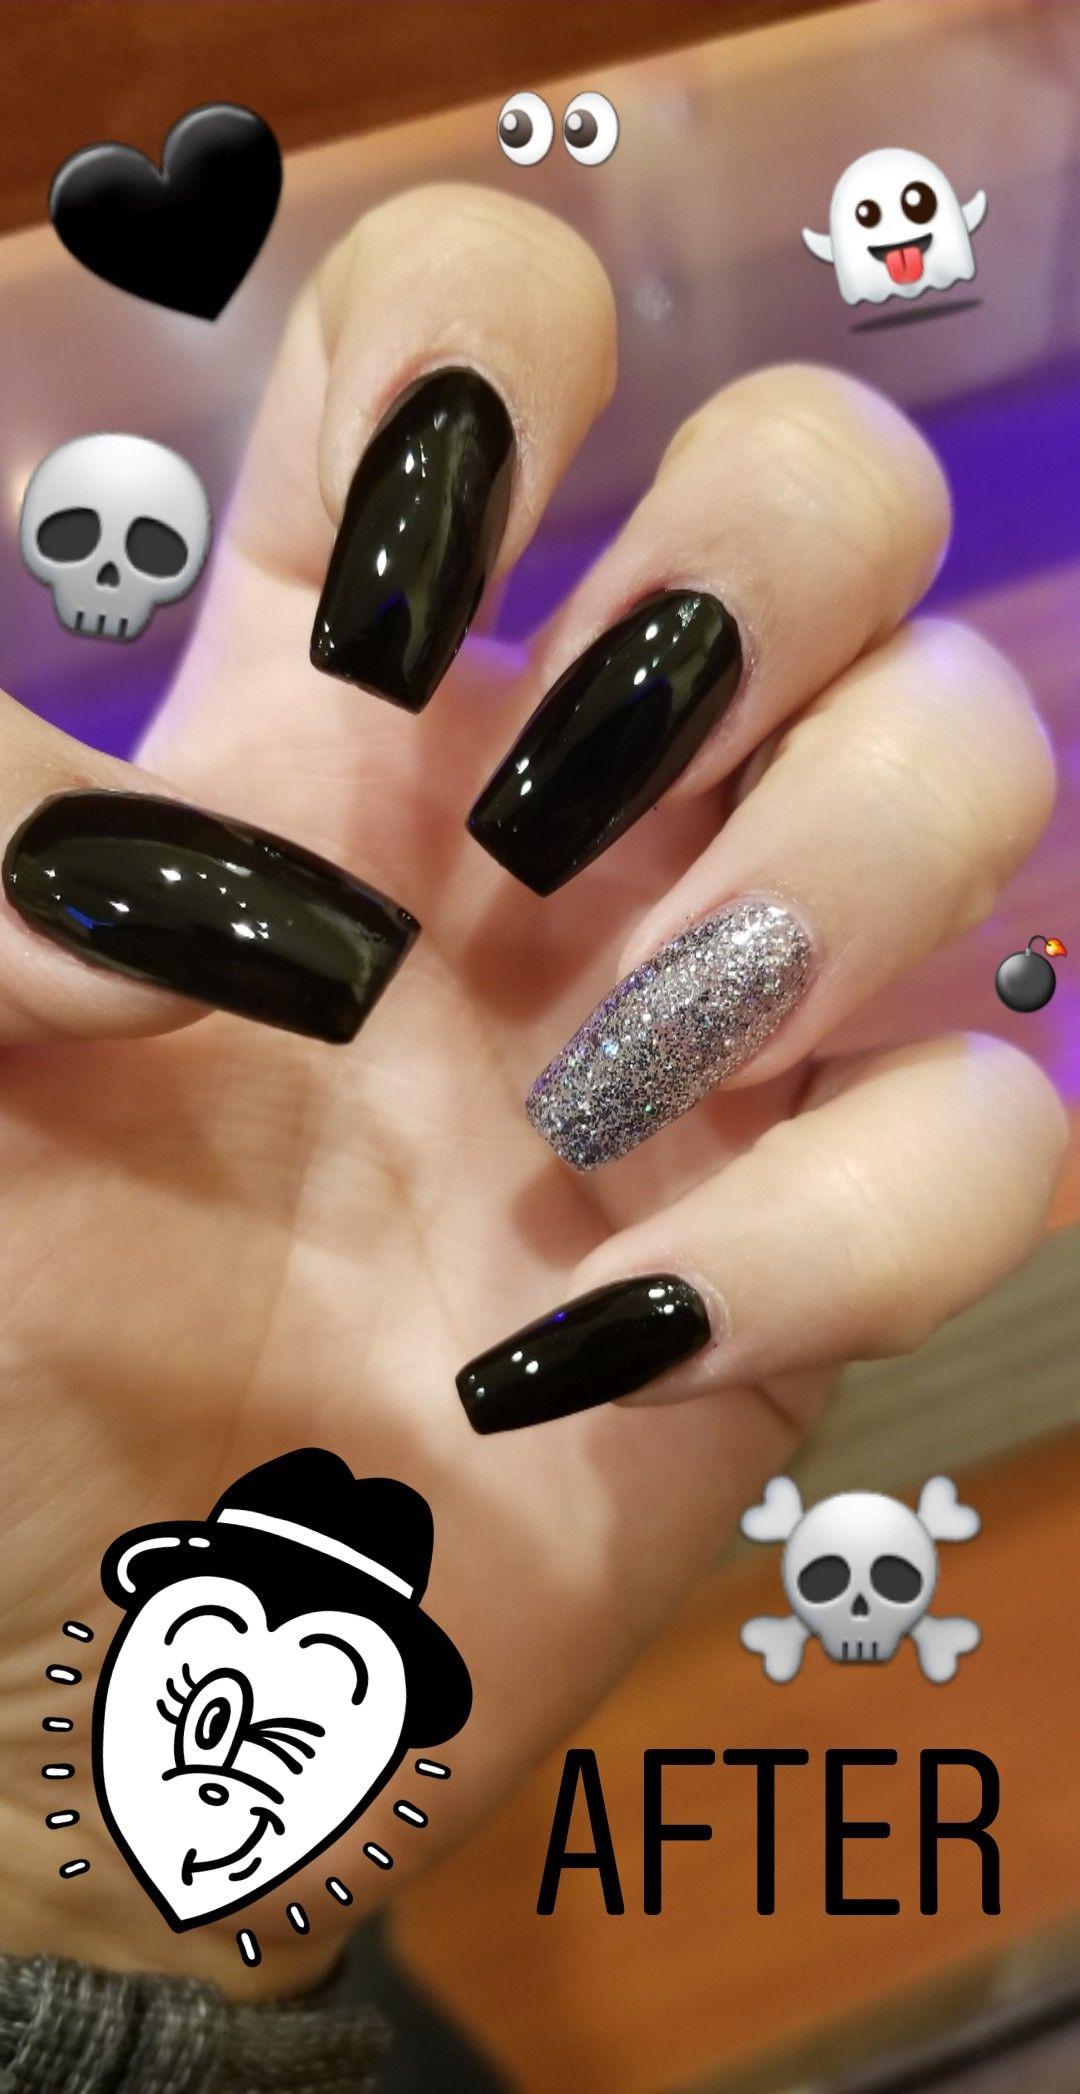 Nail Shape Coffin Color Black With Glitter Silver Length Long Season Halloween Black Nail Designs Nail Shapes Nail Designs Glitter